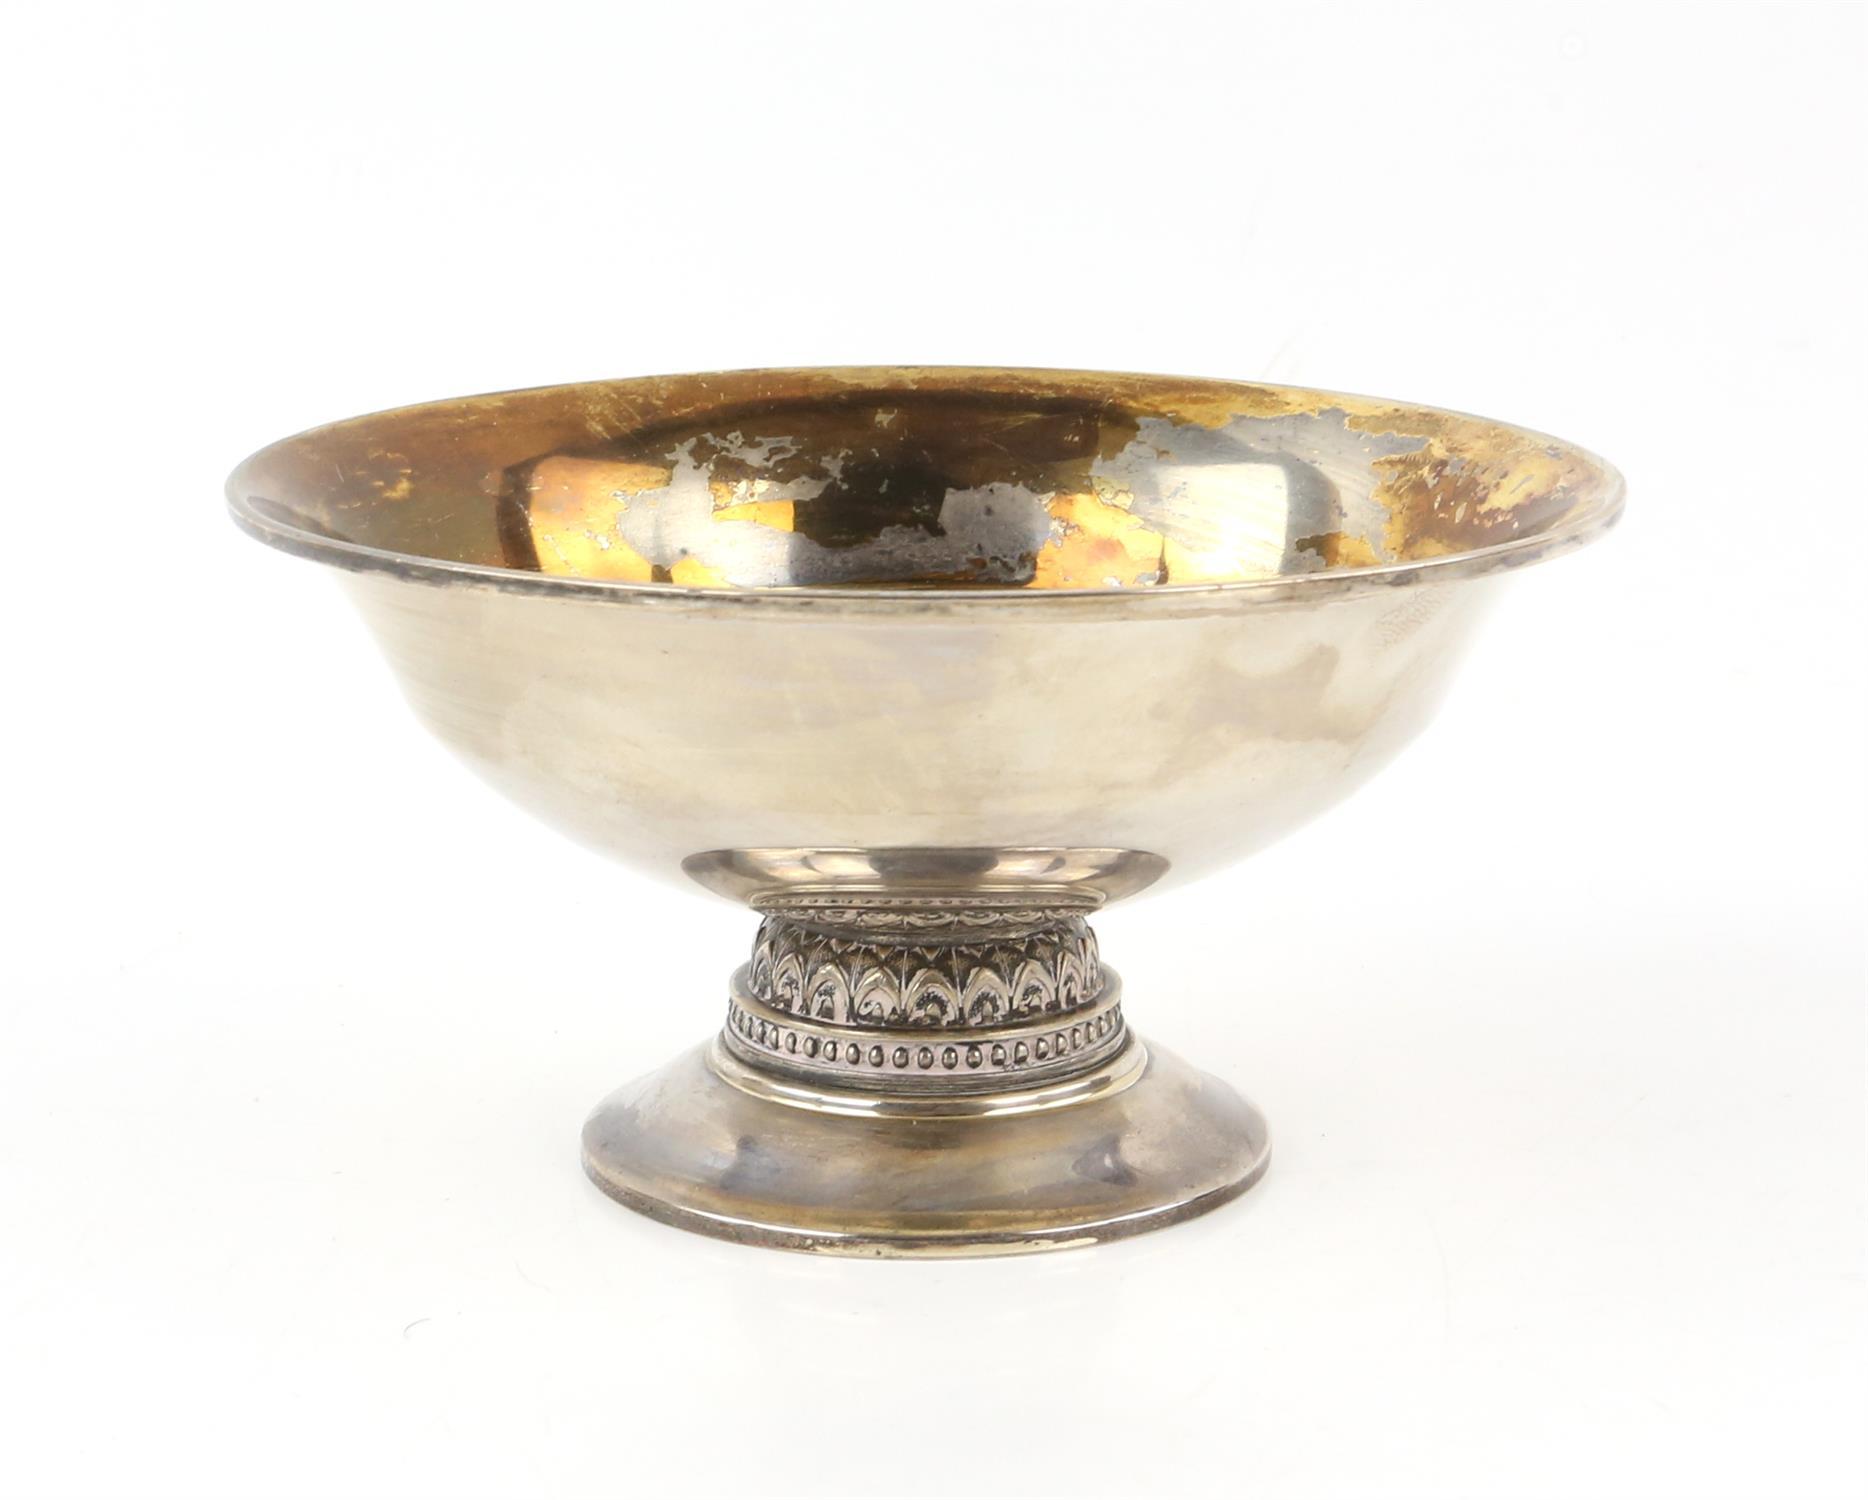 Modern silver bowl with beaded decoration on round foot, by Adie Bros. Ltd, Birmingham, 1970, 10oz,